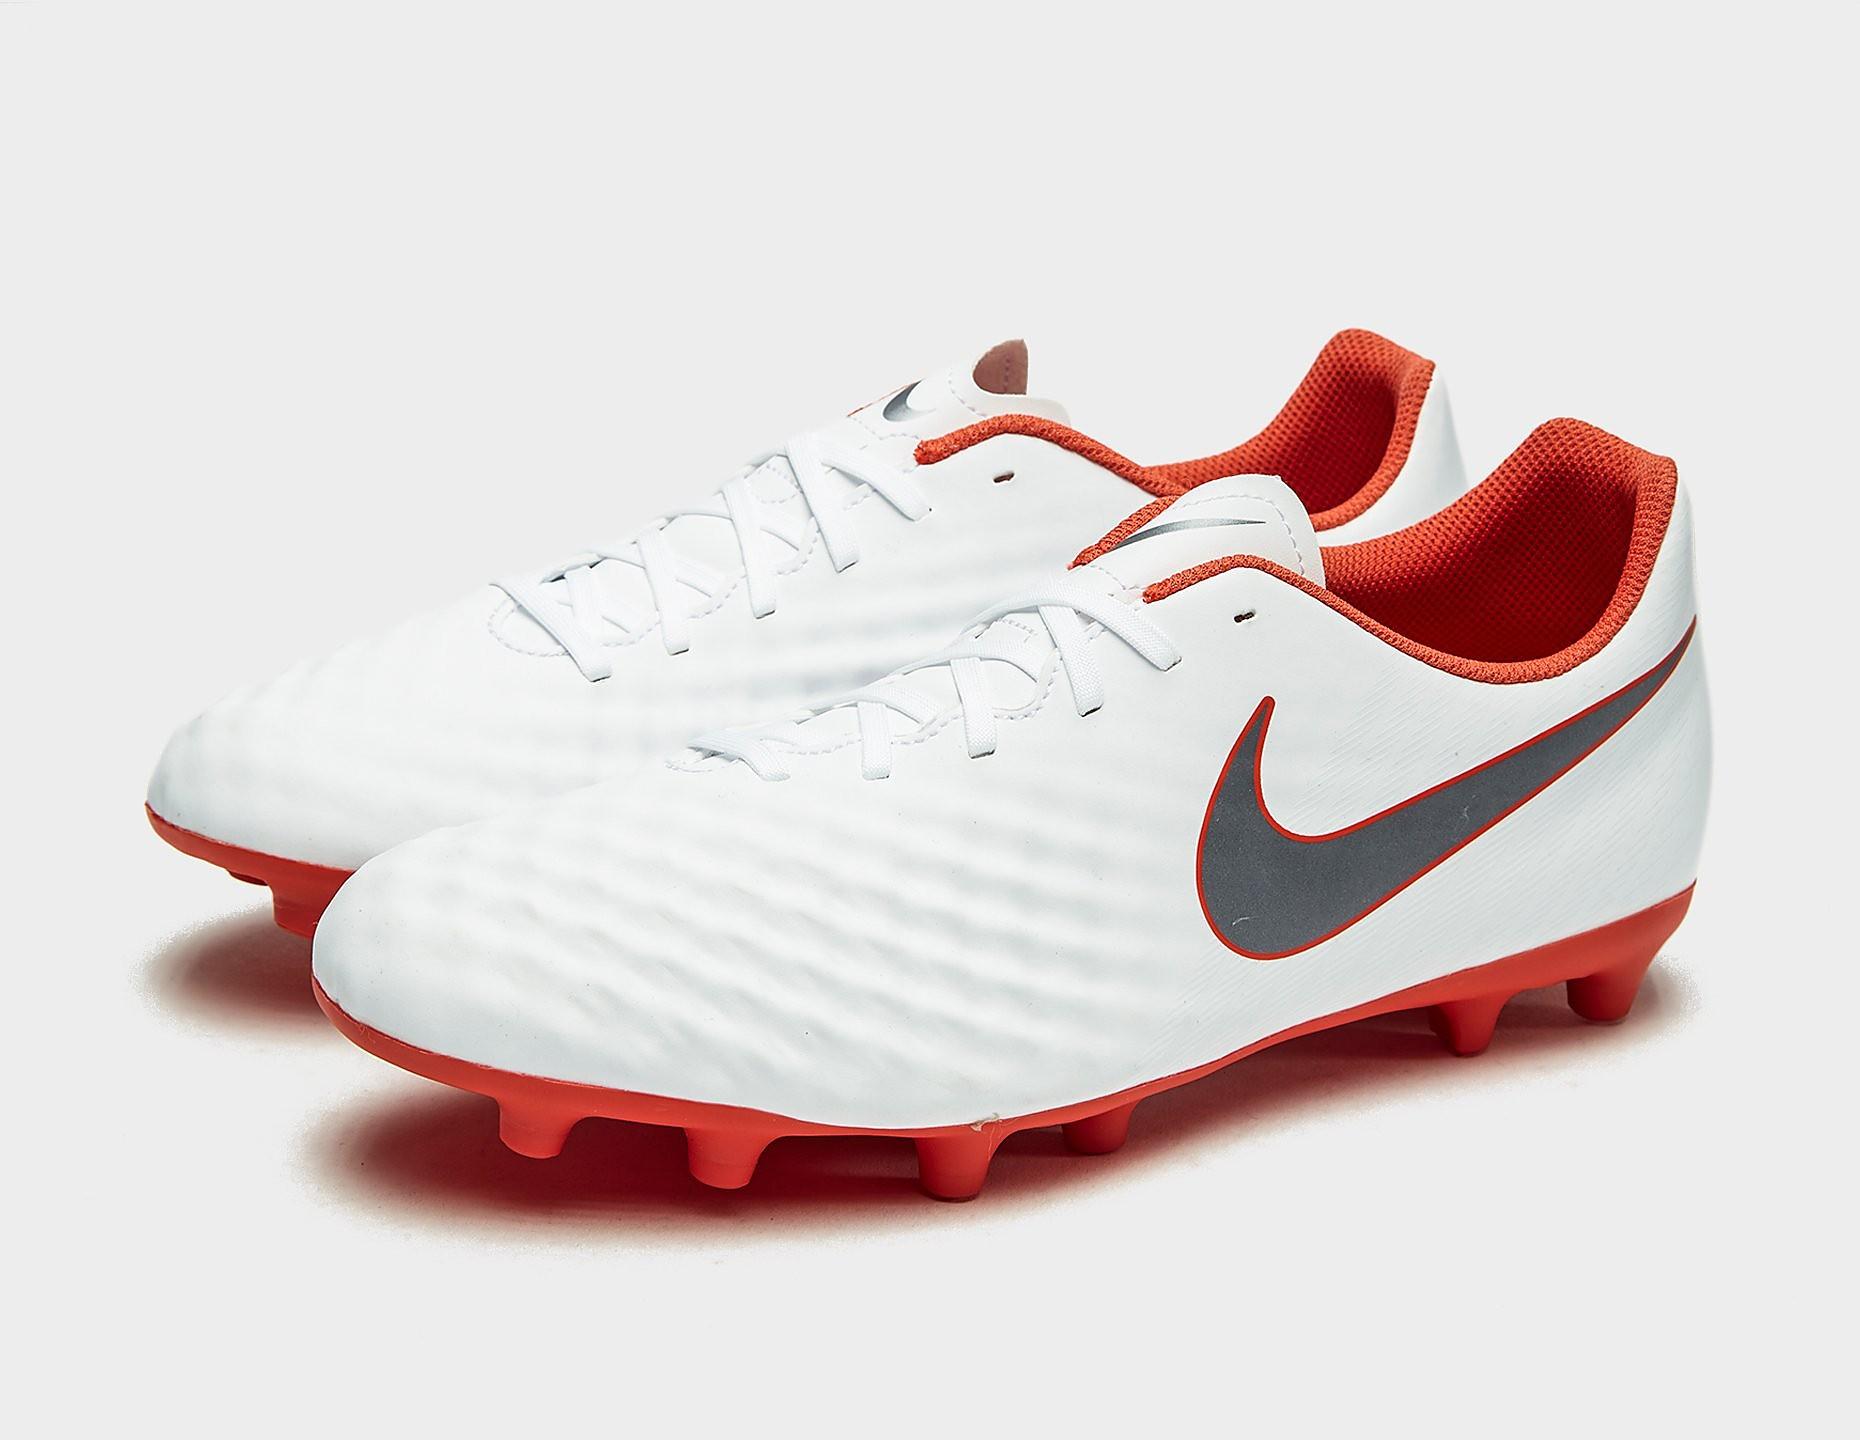 Nike Just Do It Magista Club FG